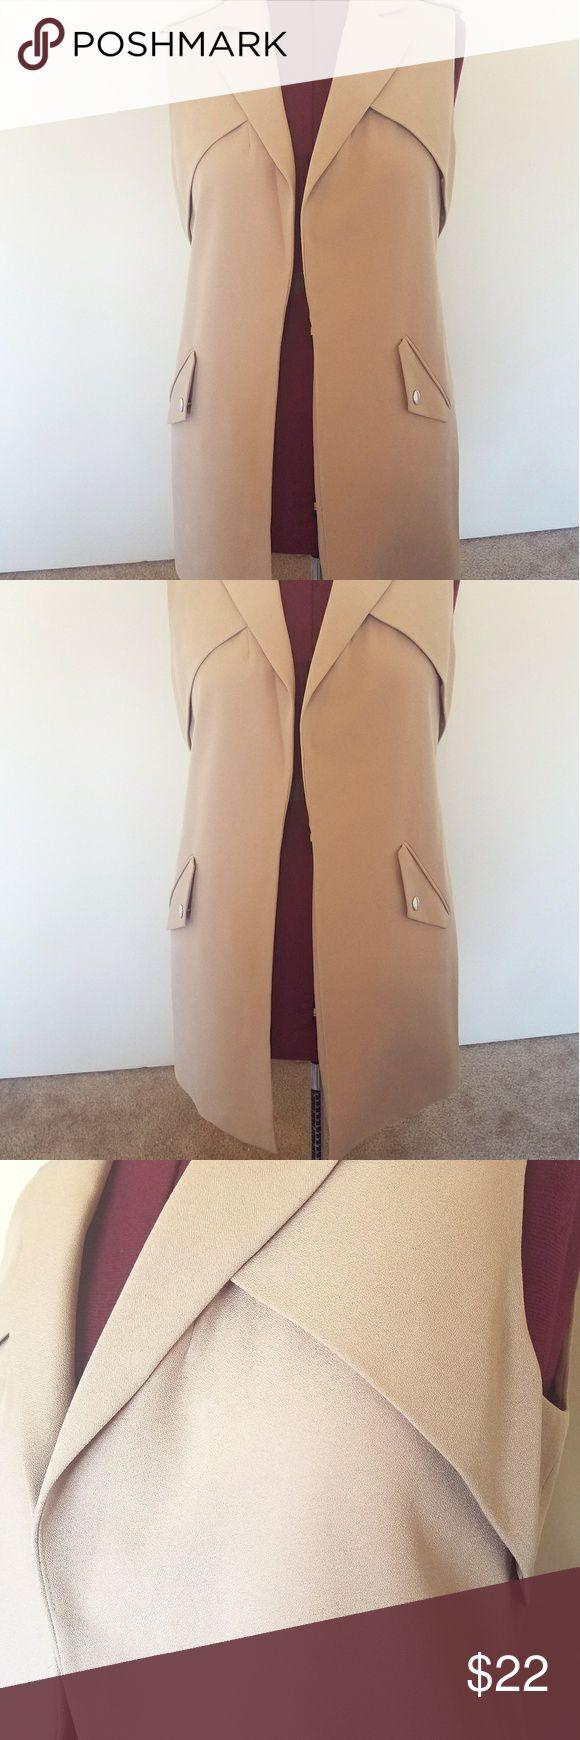 Sleeveless Long Jacket Size 10 NWT New with tag long jacket from Primark. primark Jackets & Coats Vests